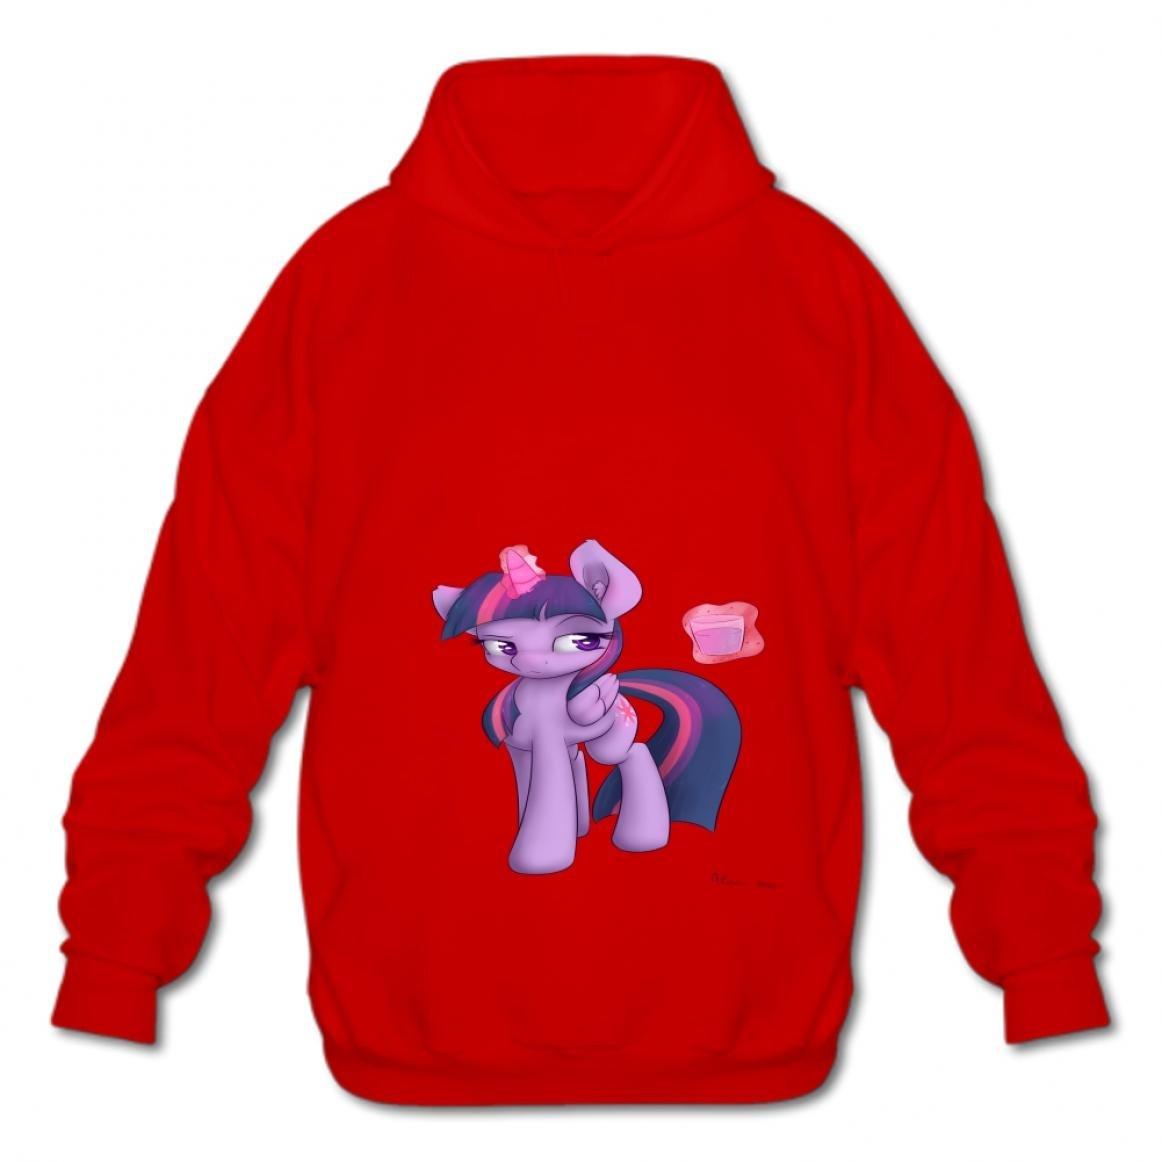 Msanlixian Fashion Hoodies-03 Cartoon Water mite Men Hoodies Style Cotton Pullover Sweatshirt